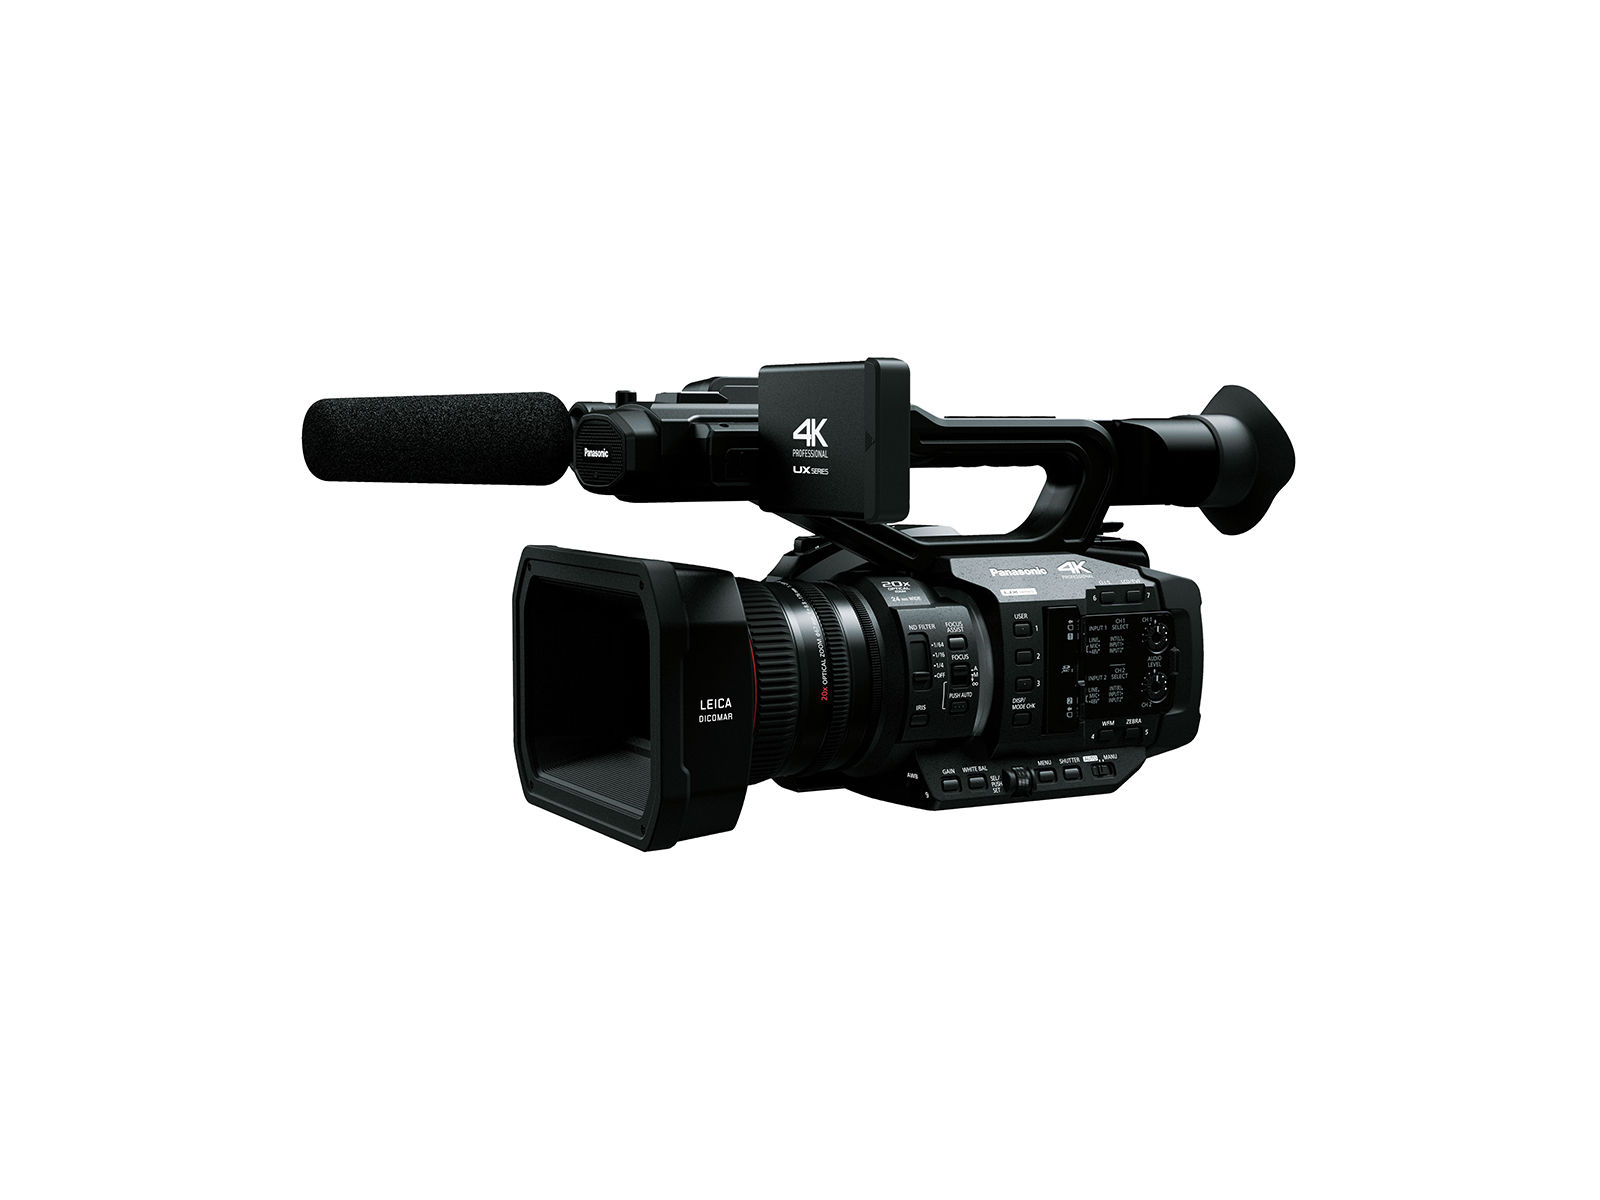 Panasonic AG-UX180EJ8 | 4K Camcorder mit integriertem 20x Objektiv, 24mm Weitwinkel Zoom Objektiv